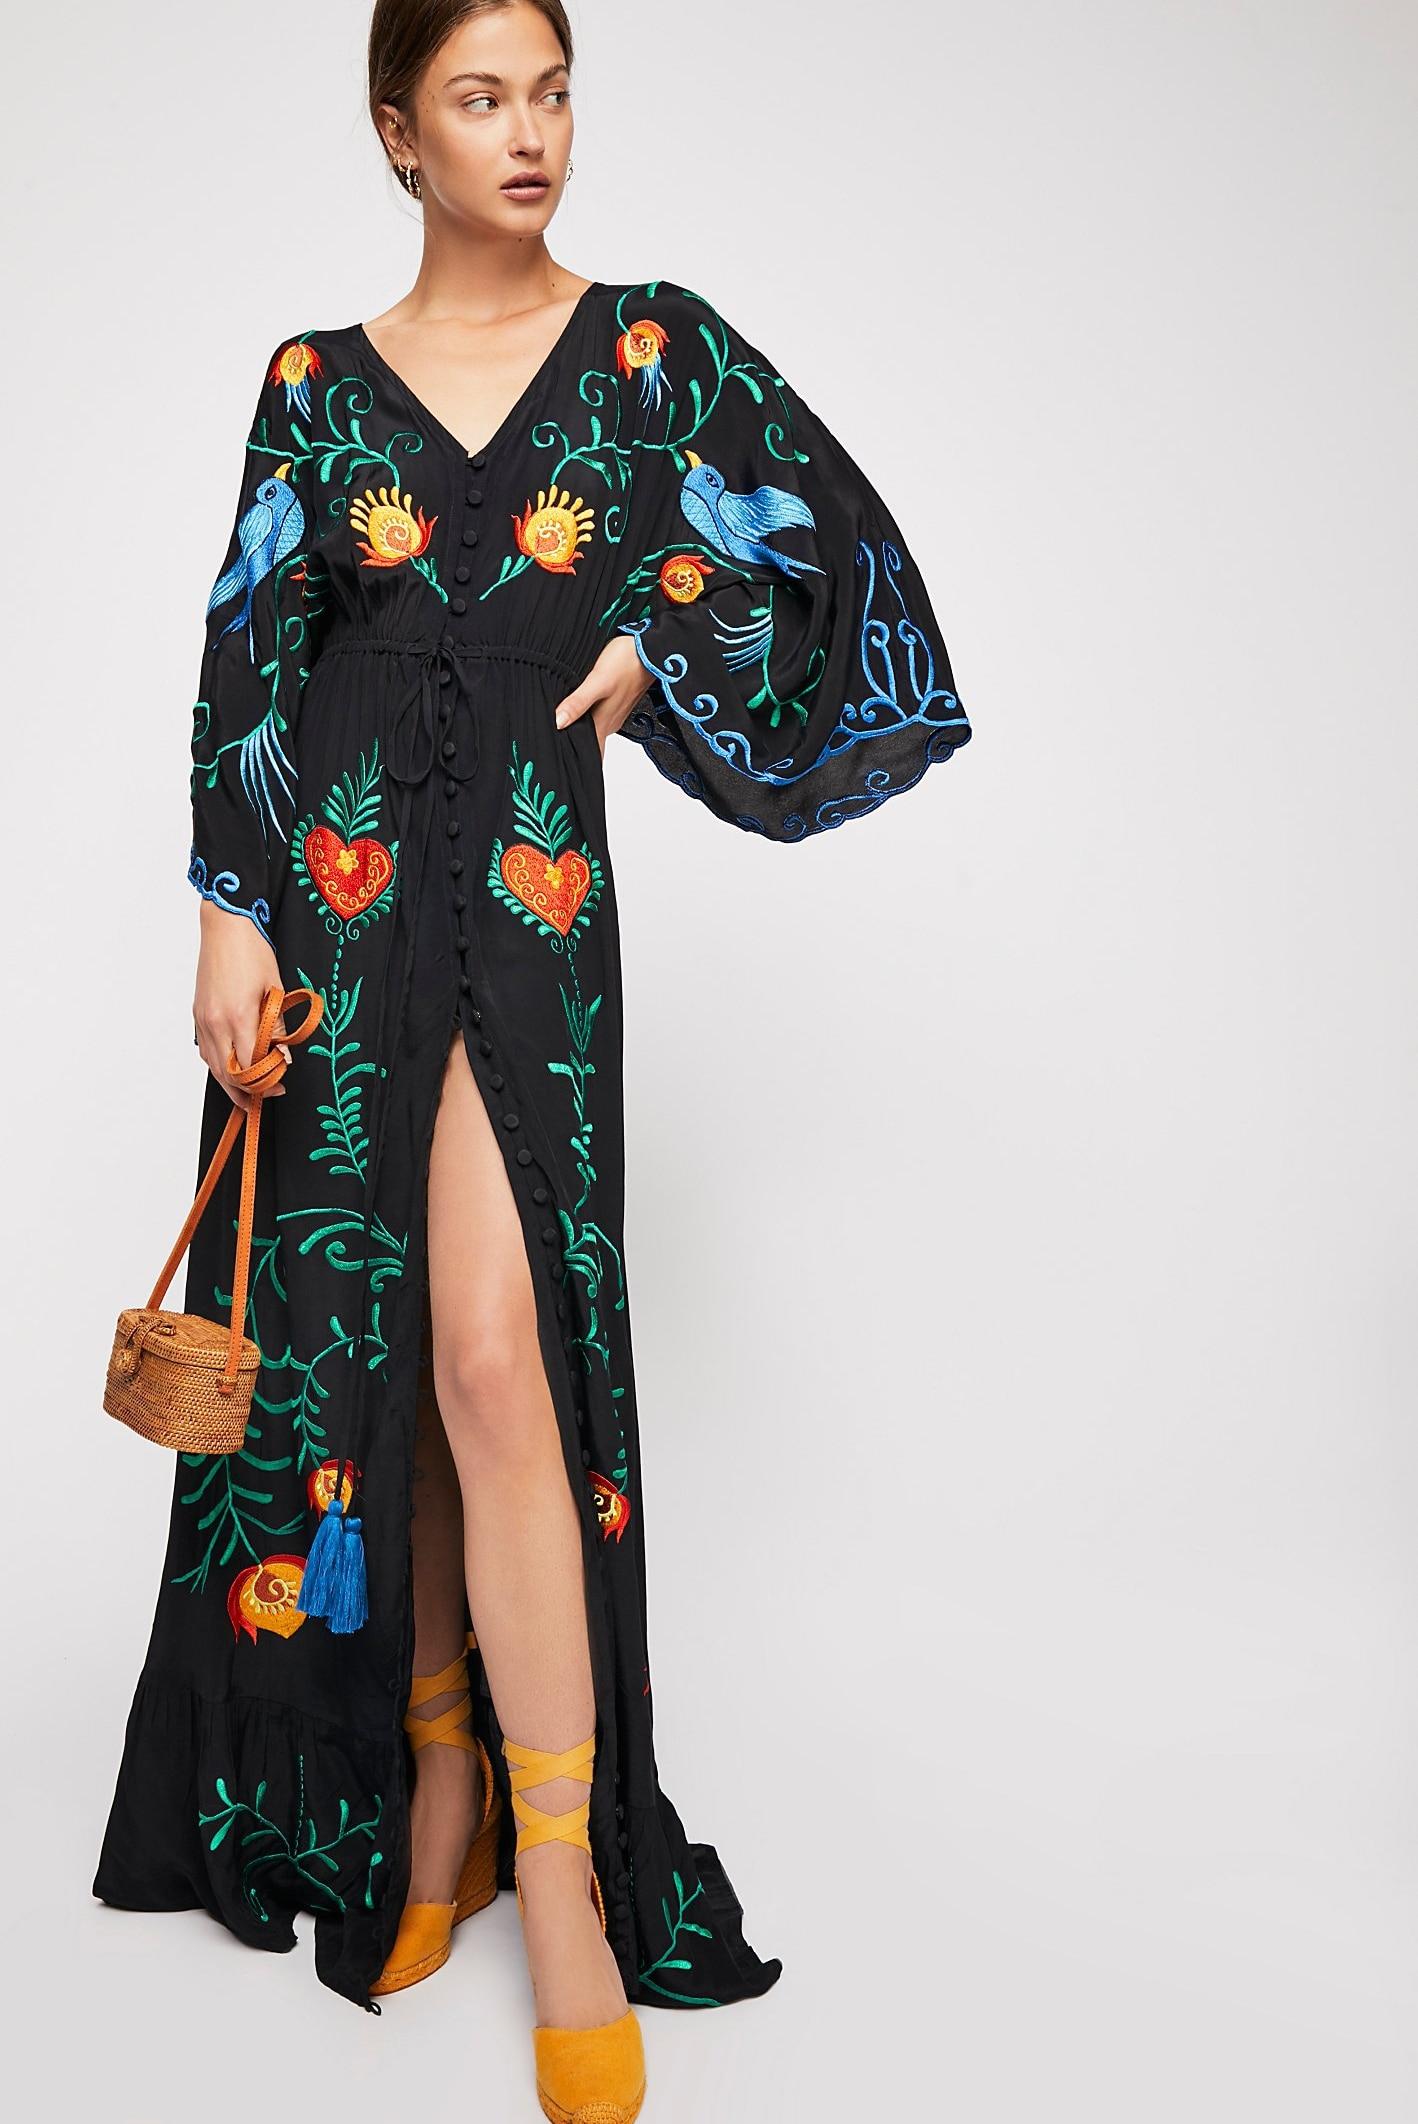 7f7656c975124d Jastie 2018 Spring Autumn Women Dress Loose Casual Kimono Dresses Floral  embroidered Maxi Dress Boho Ruffle Hem Beach Dresses